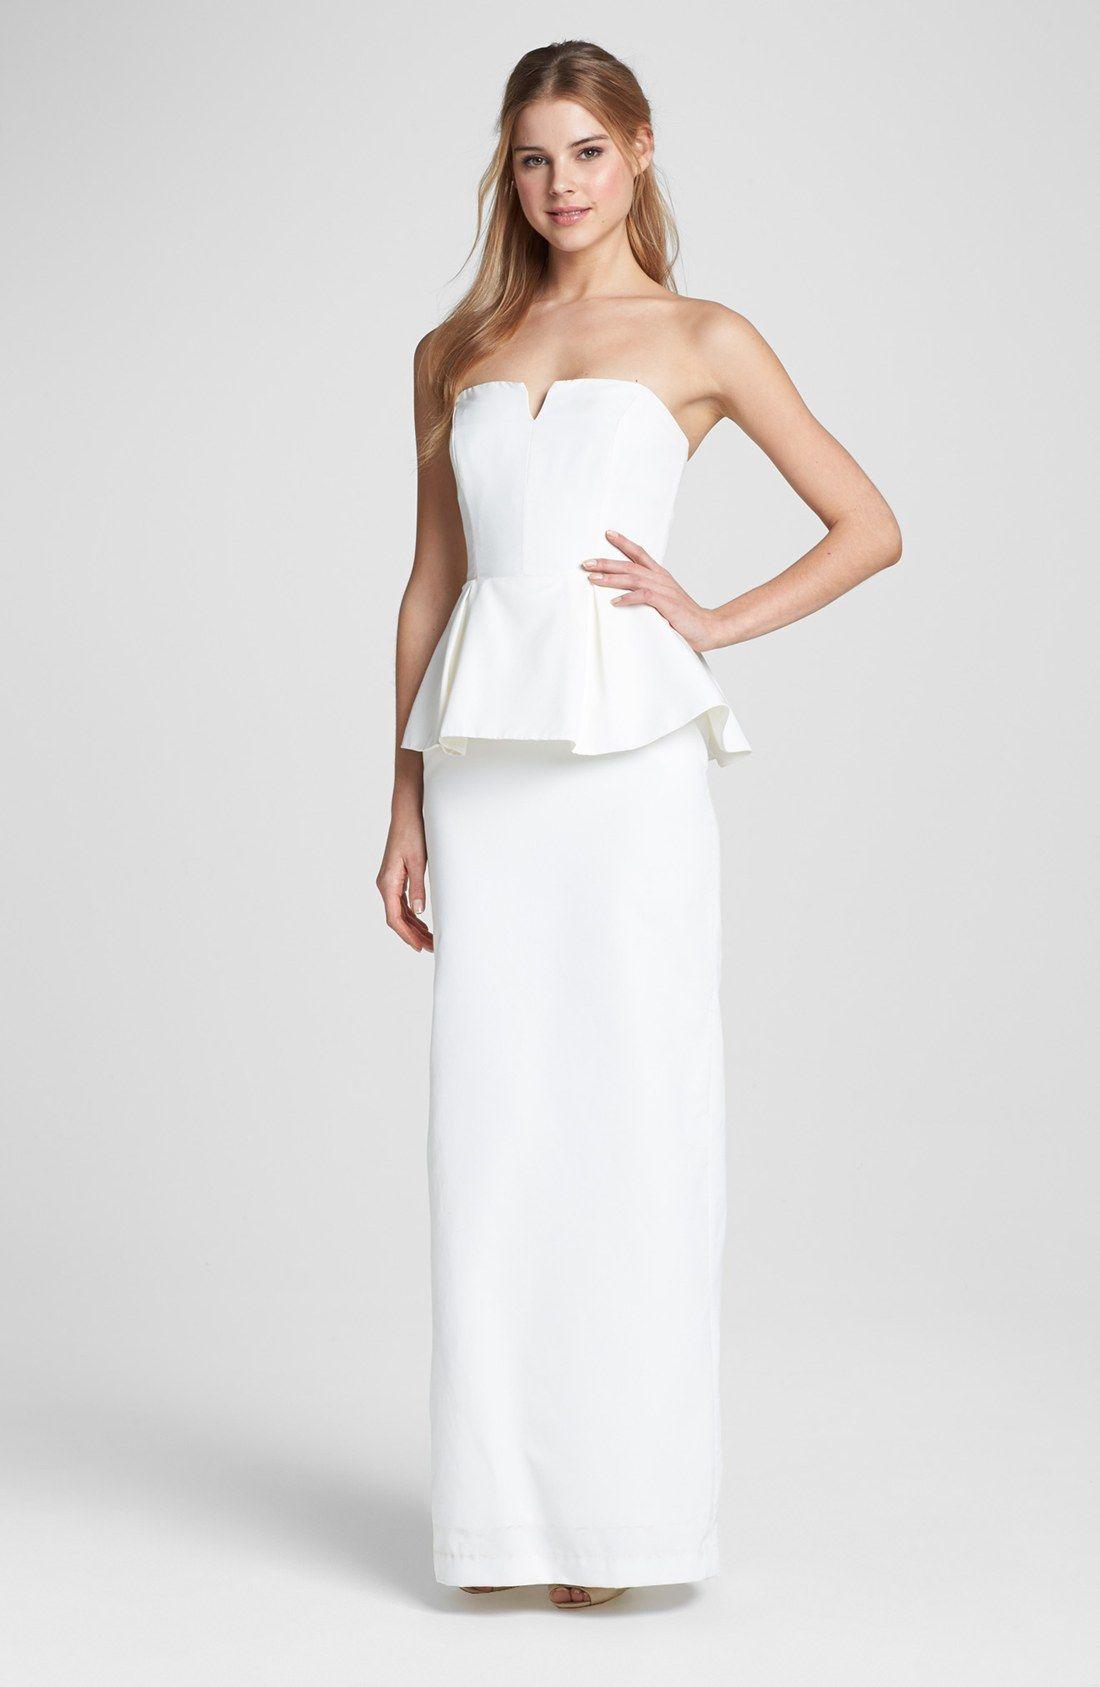 Nicole Miller Strapless Peplum Gown   Engagement Rings & Wedding ...